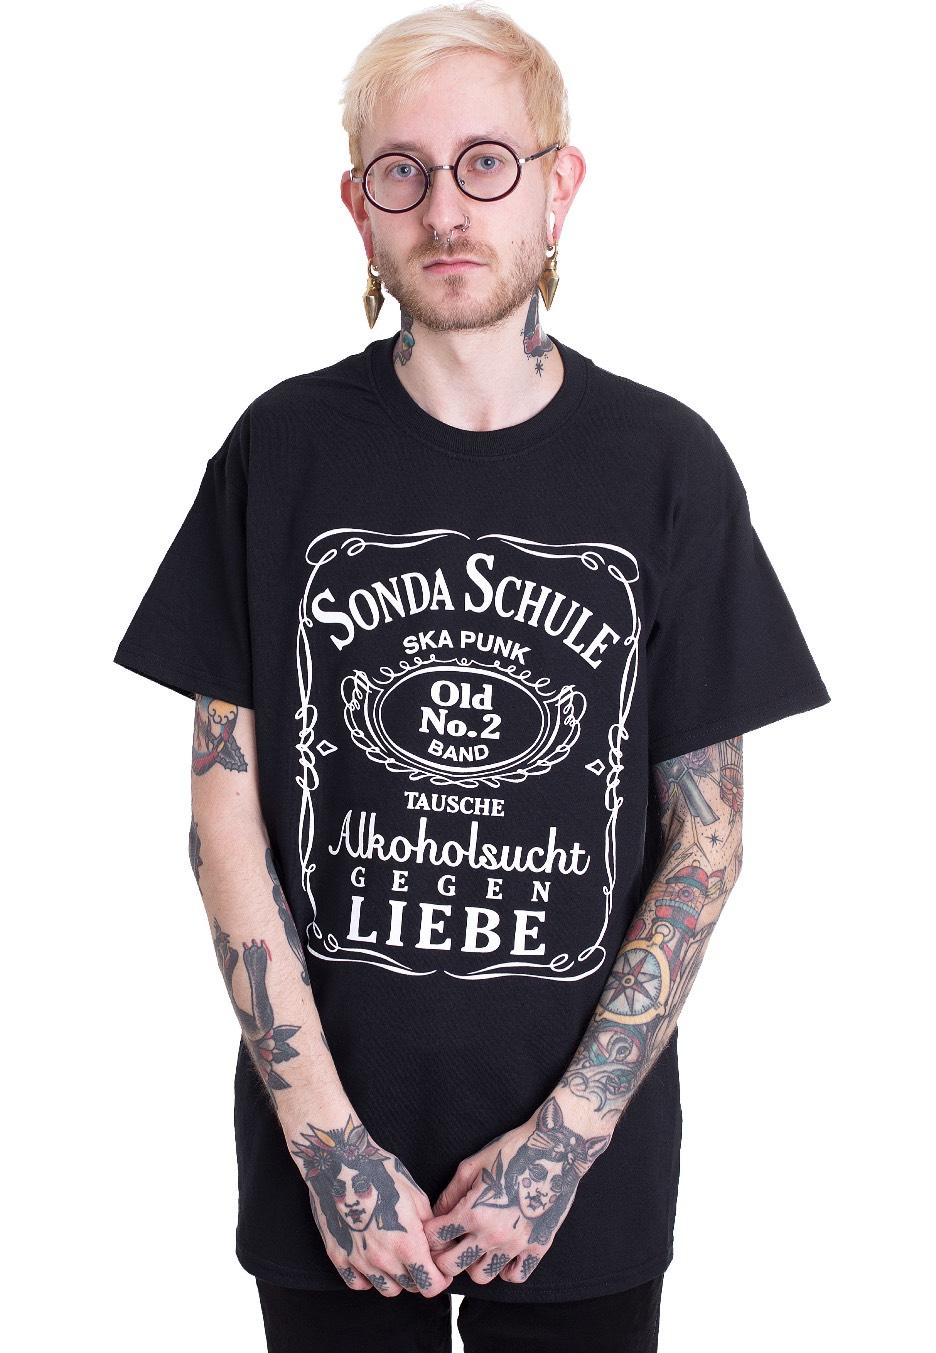 Sondaschule - Alkoholsucht - - T-Shirts